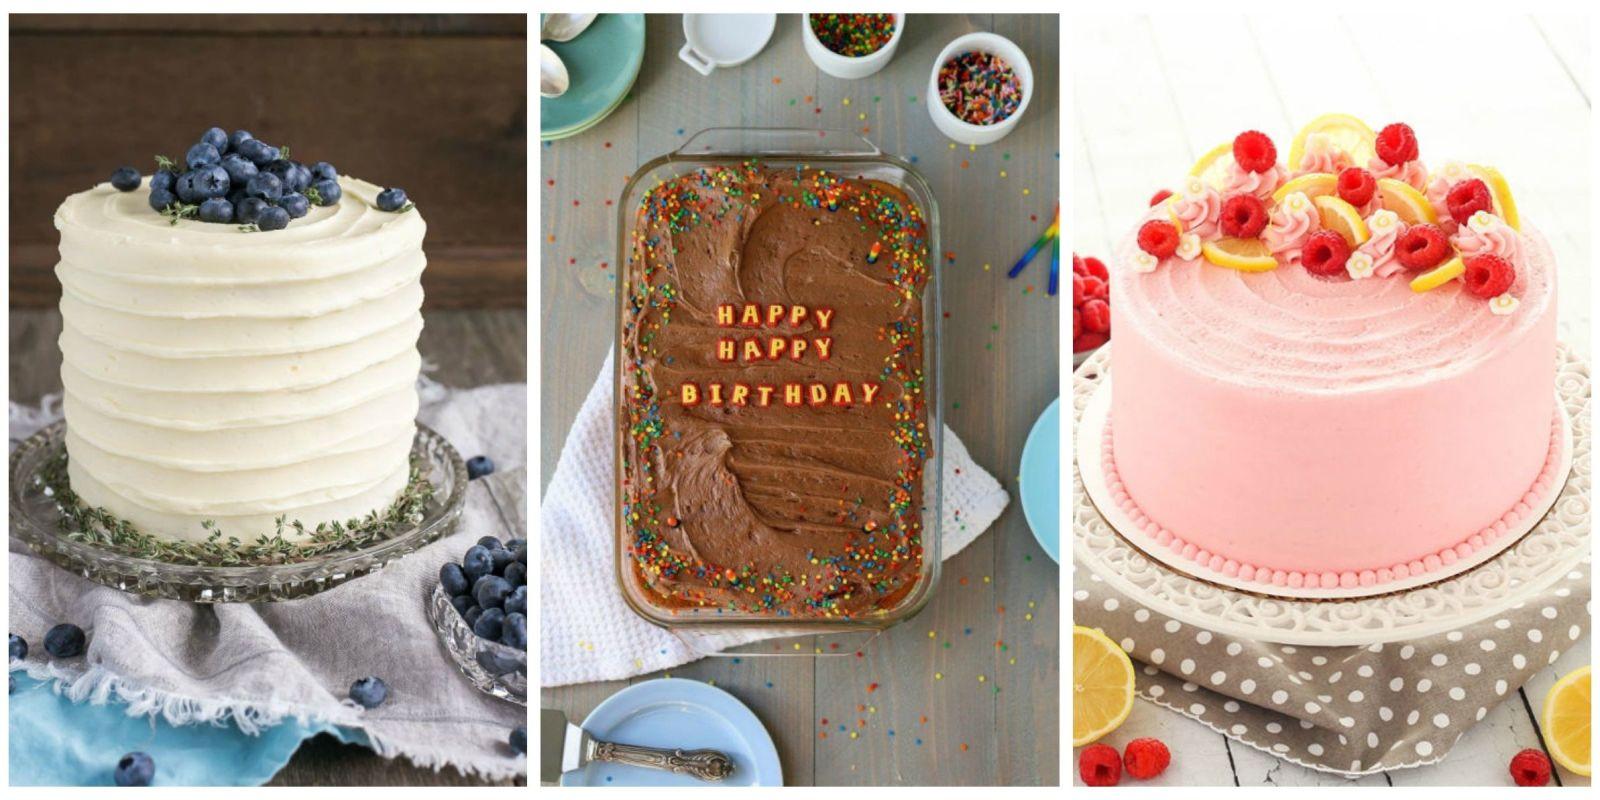 22 Homemade Birthday Cake Ideas